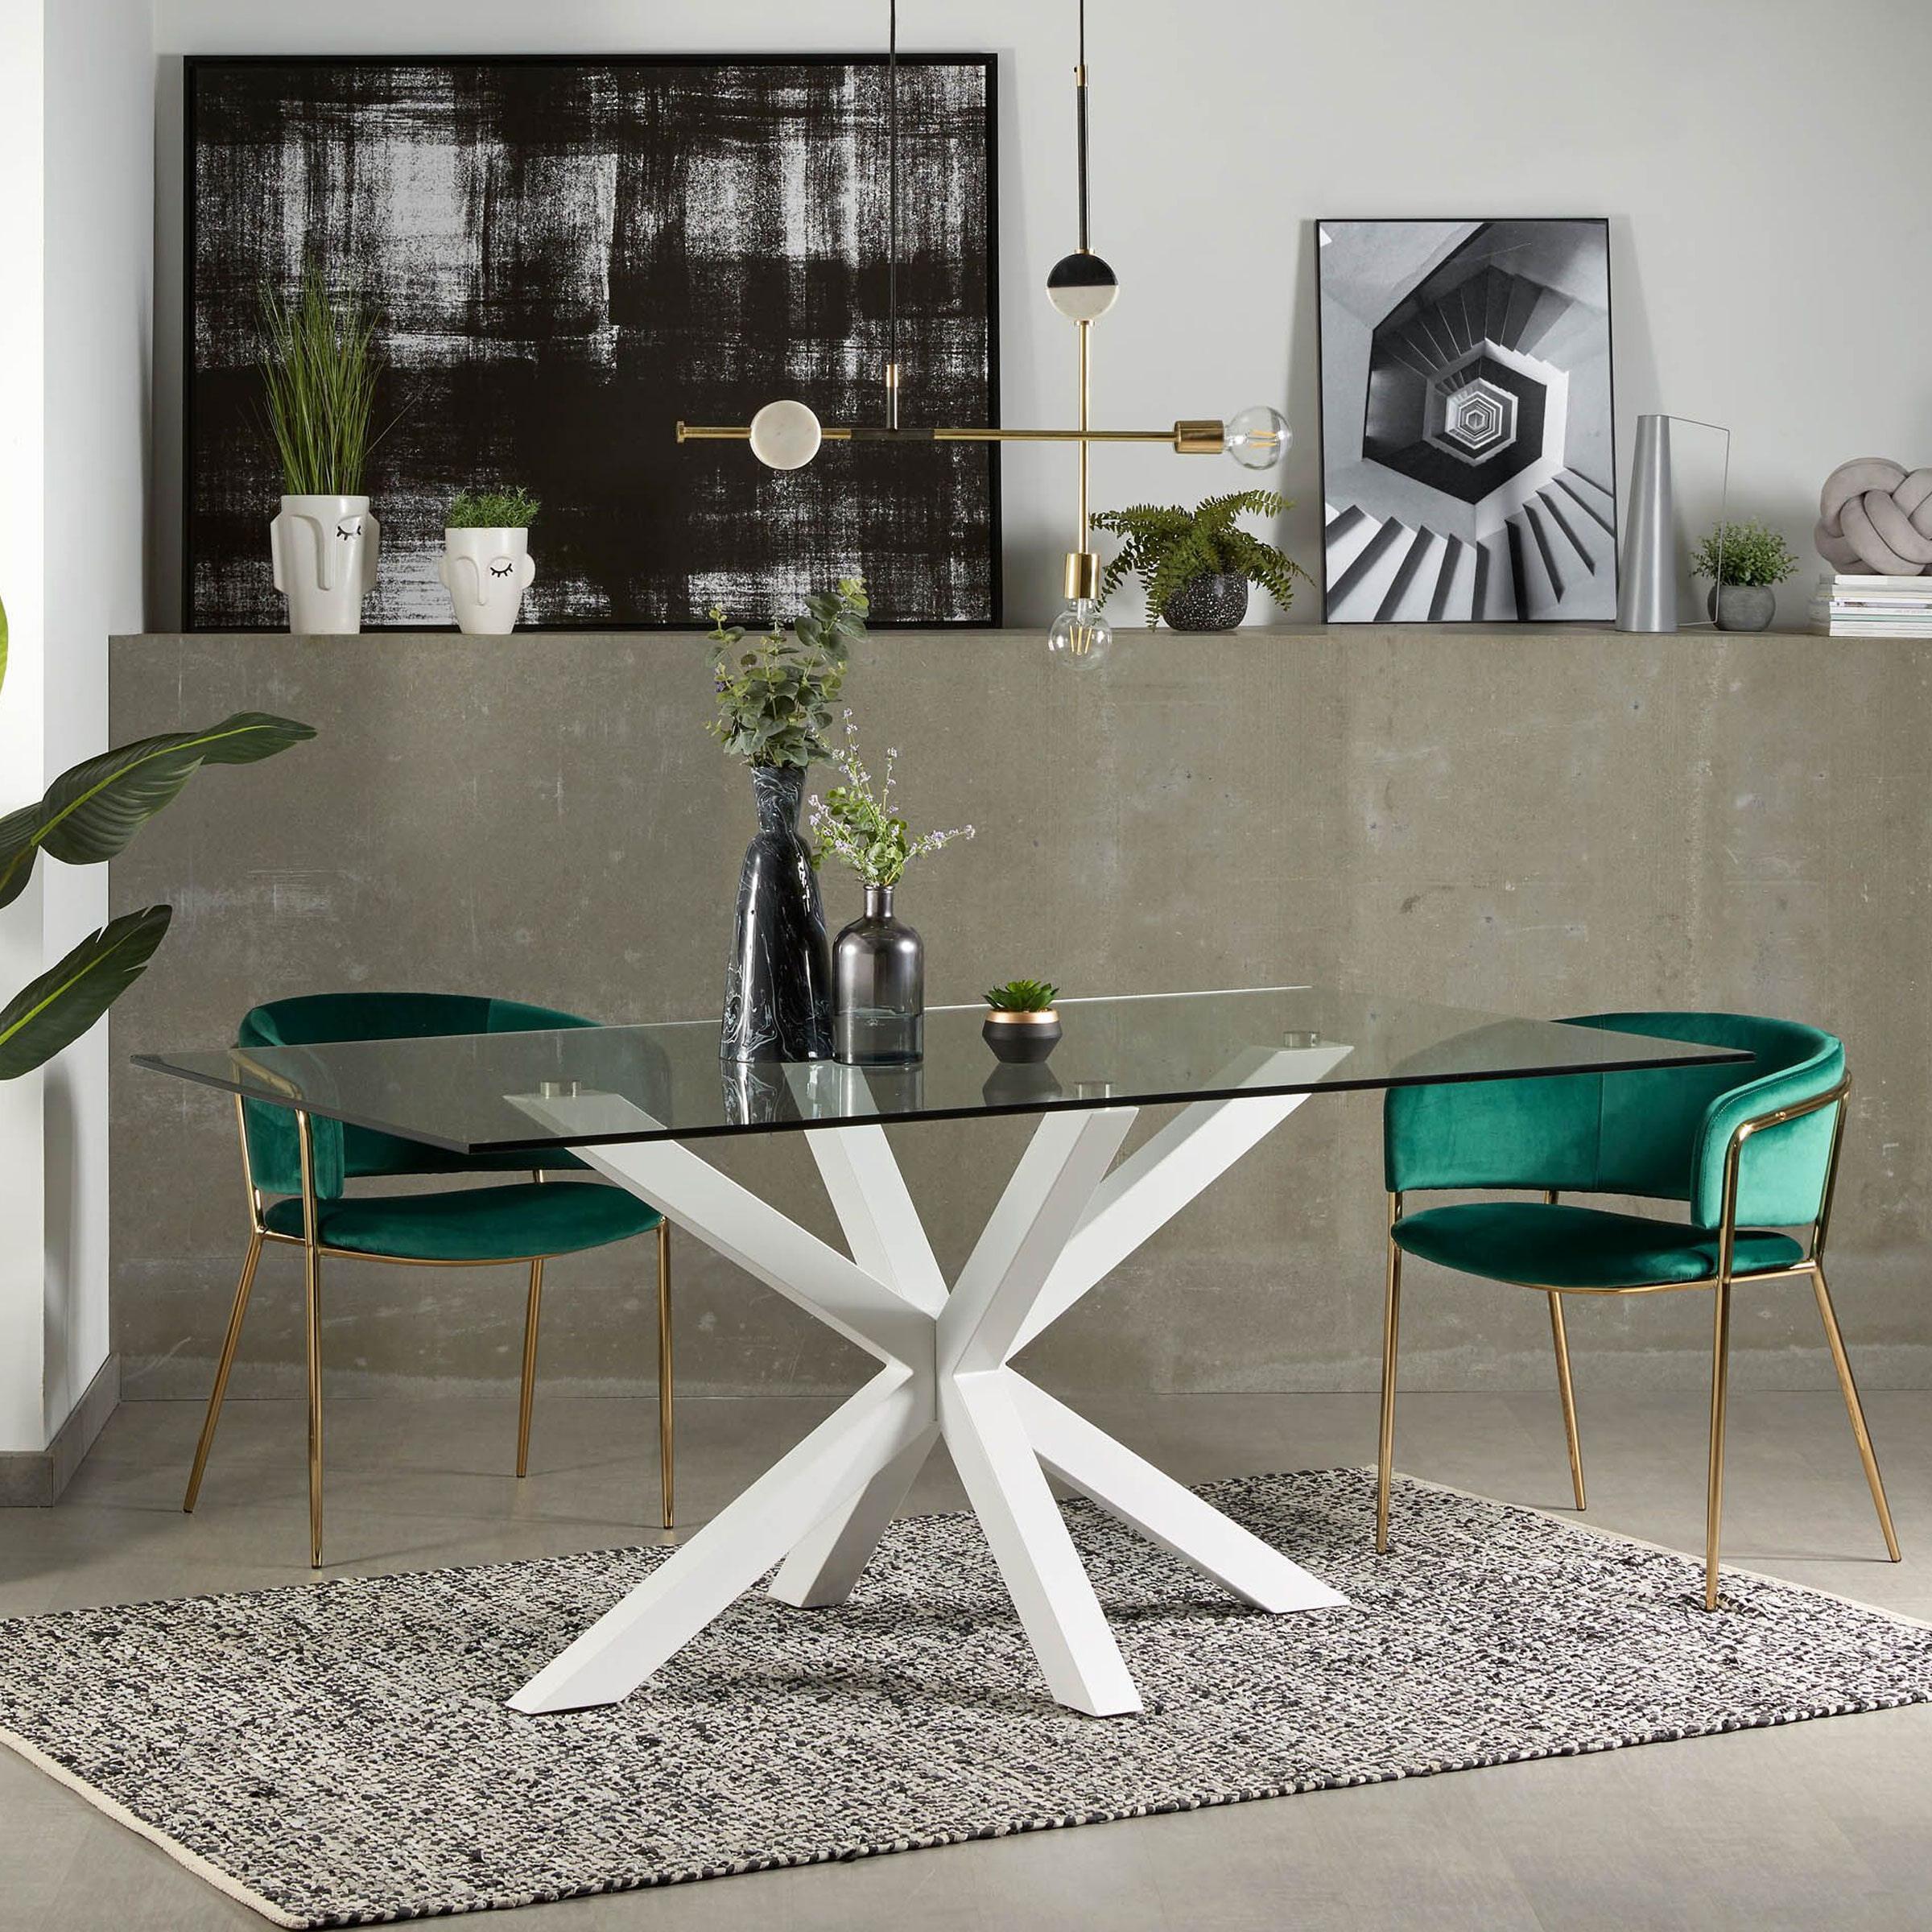 Kave Home Eettafel 'Argo' wit, 180 x 100cm